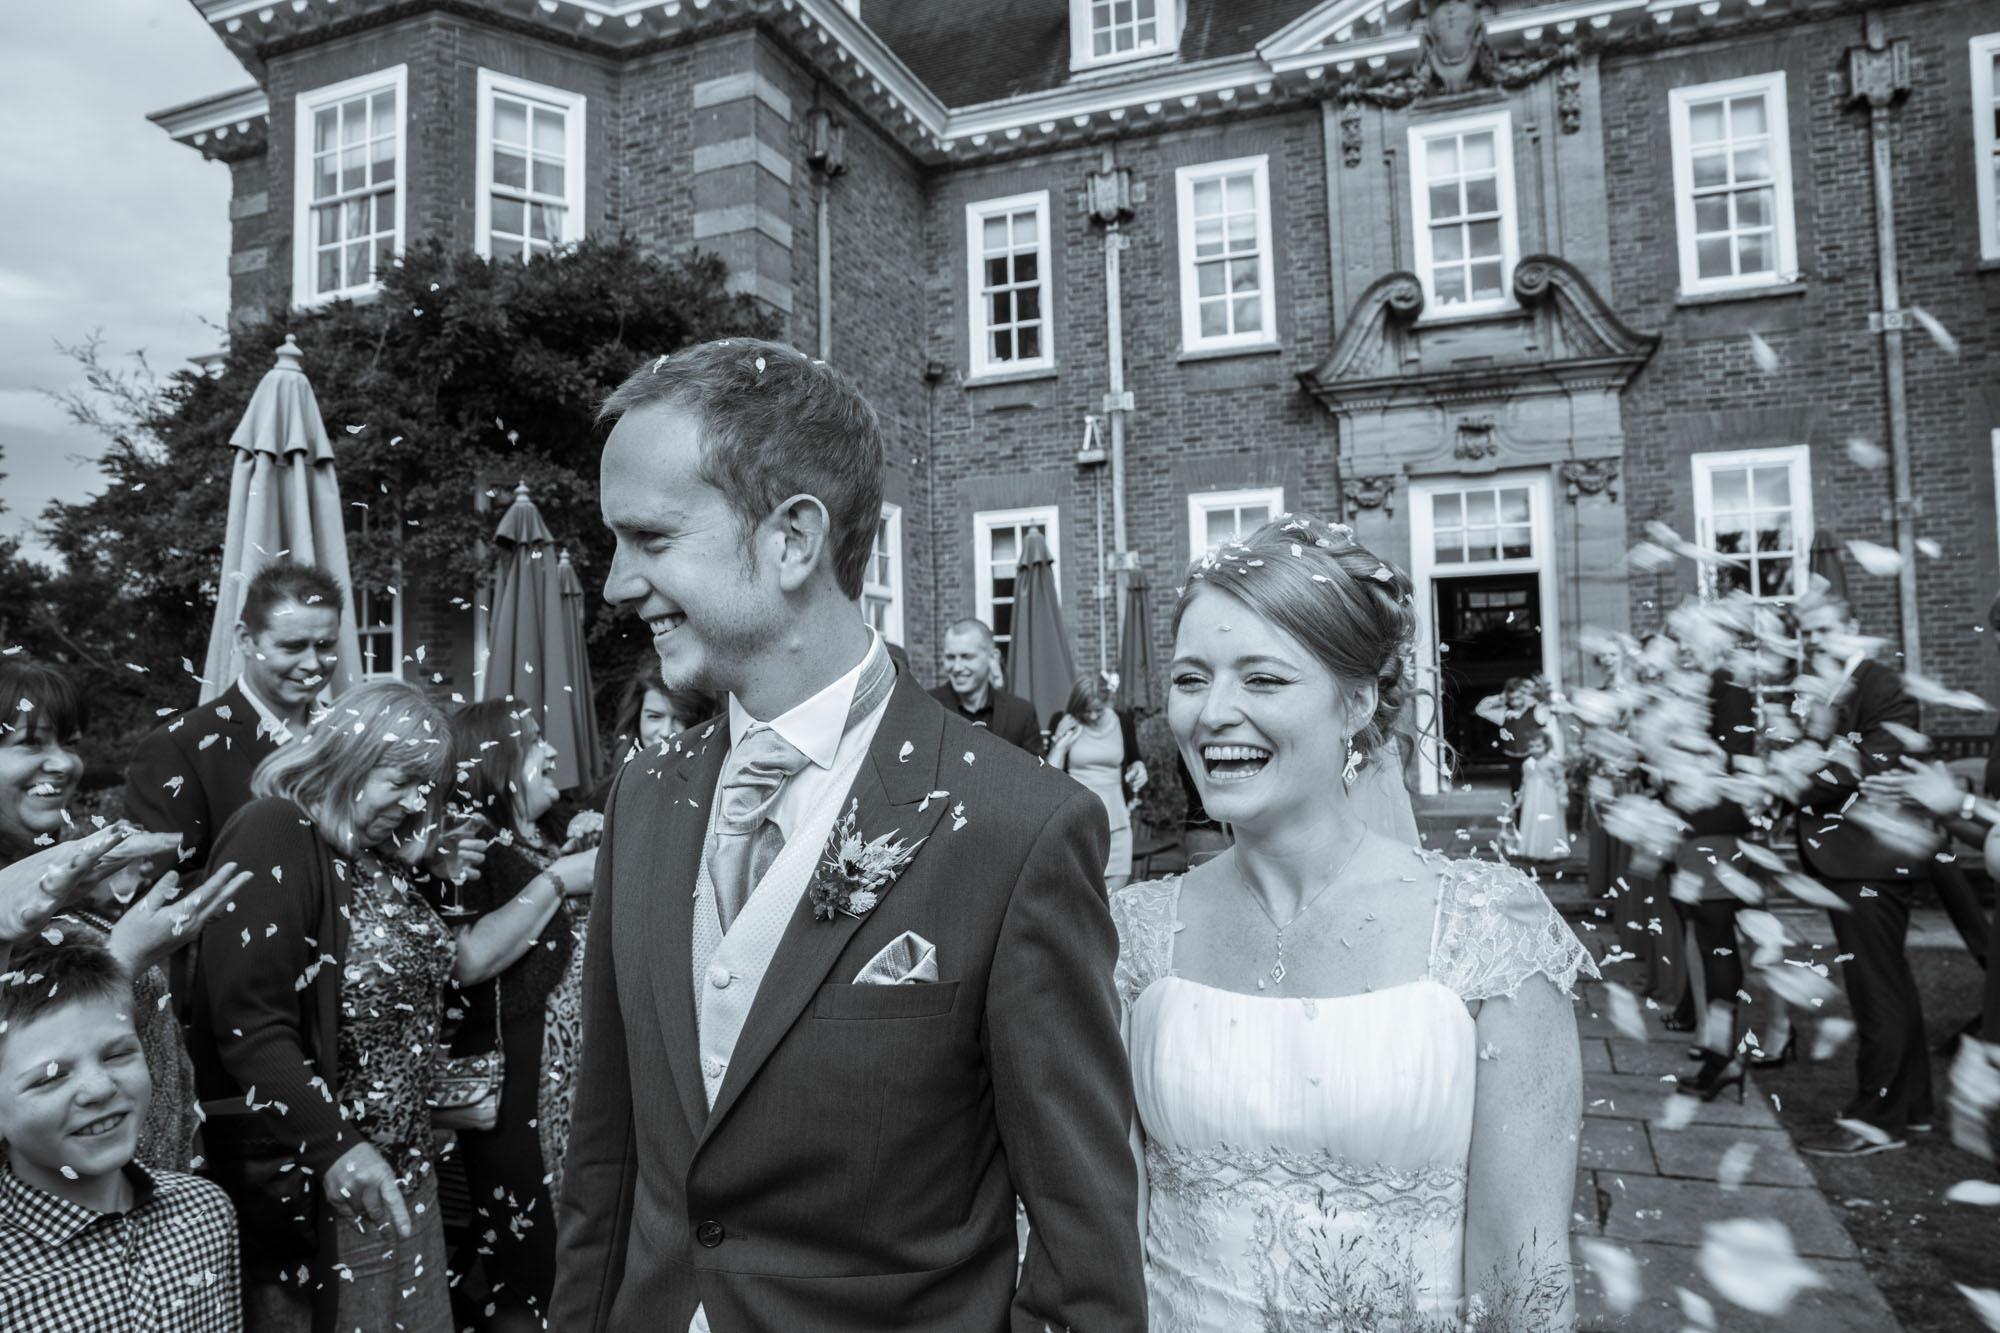 weddings-couples-love-photographer-oxford-london-jonathan-self-photography-48.jpg